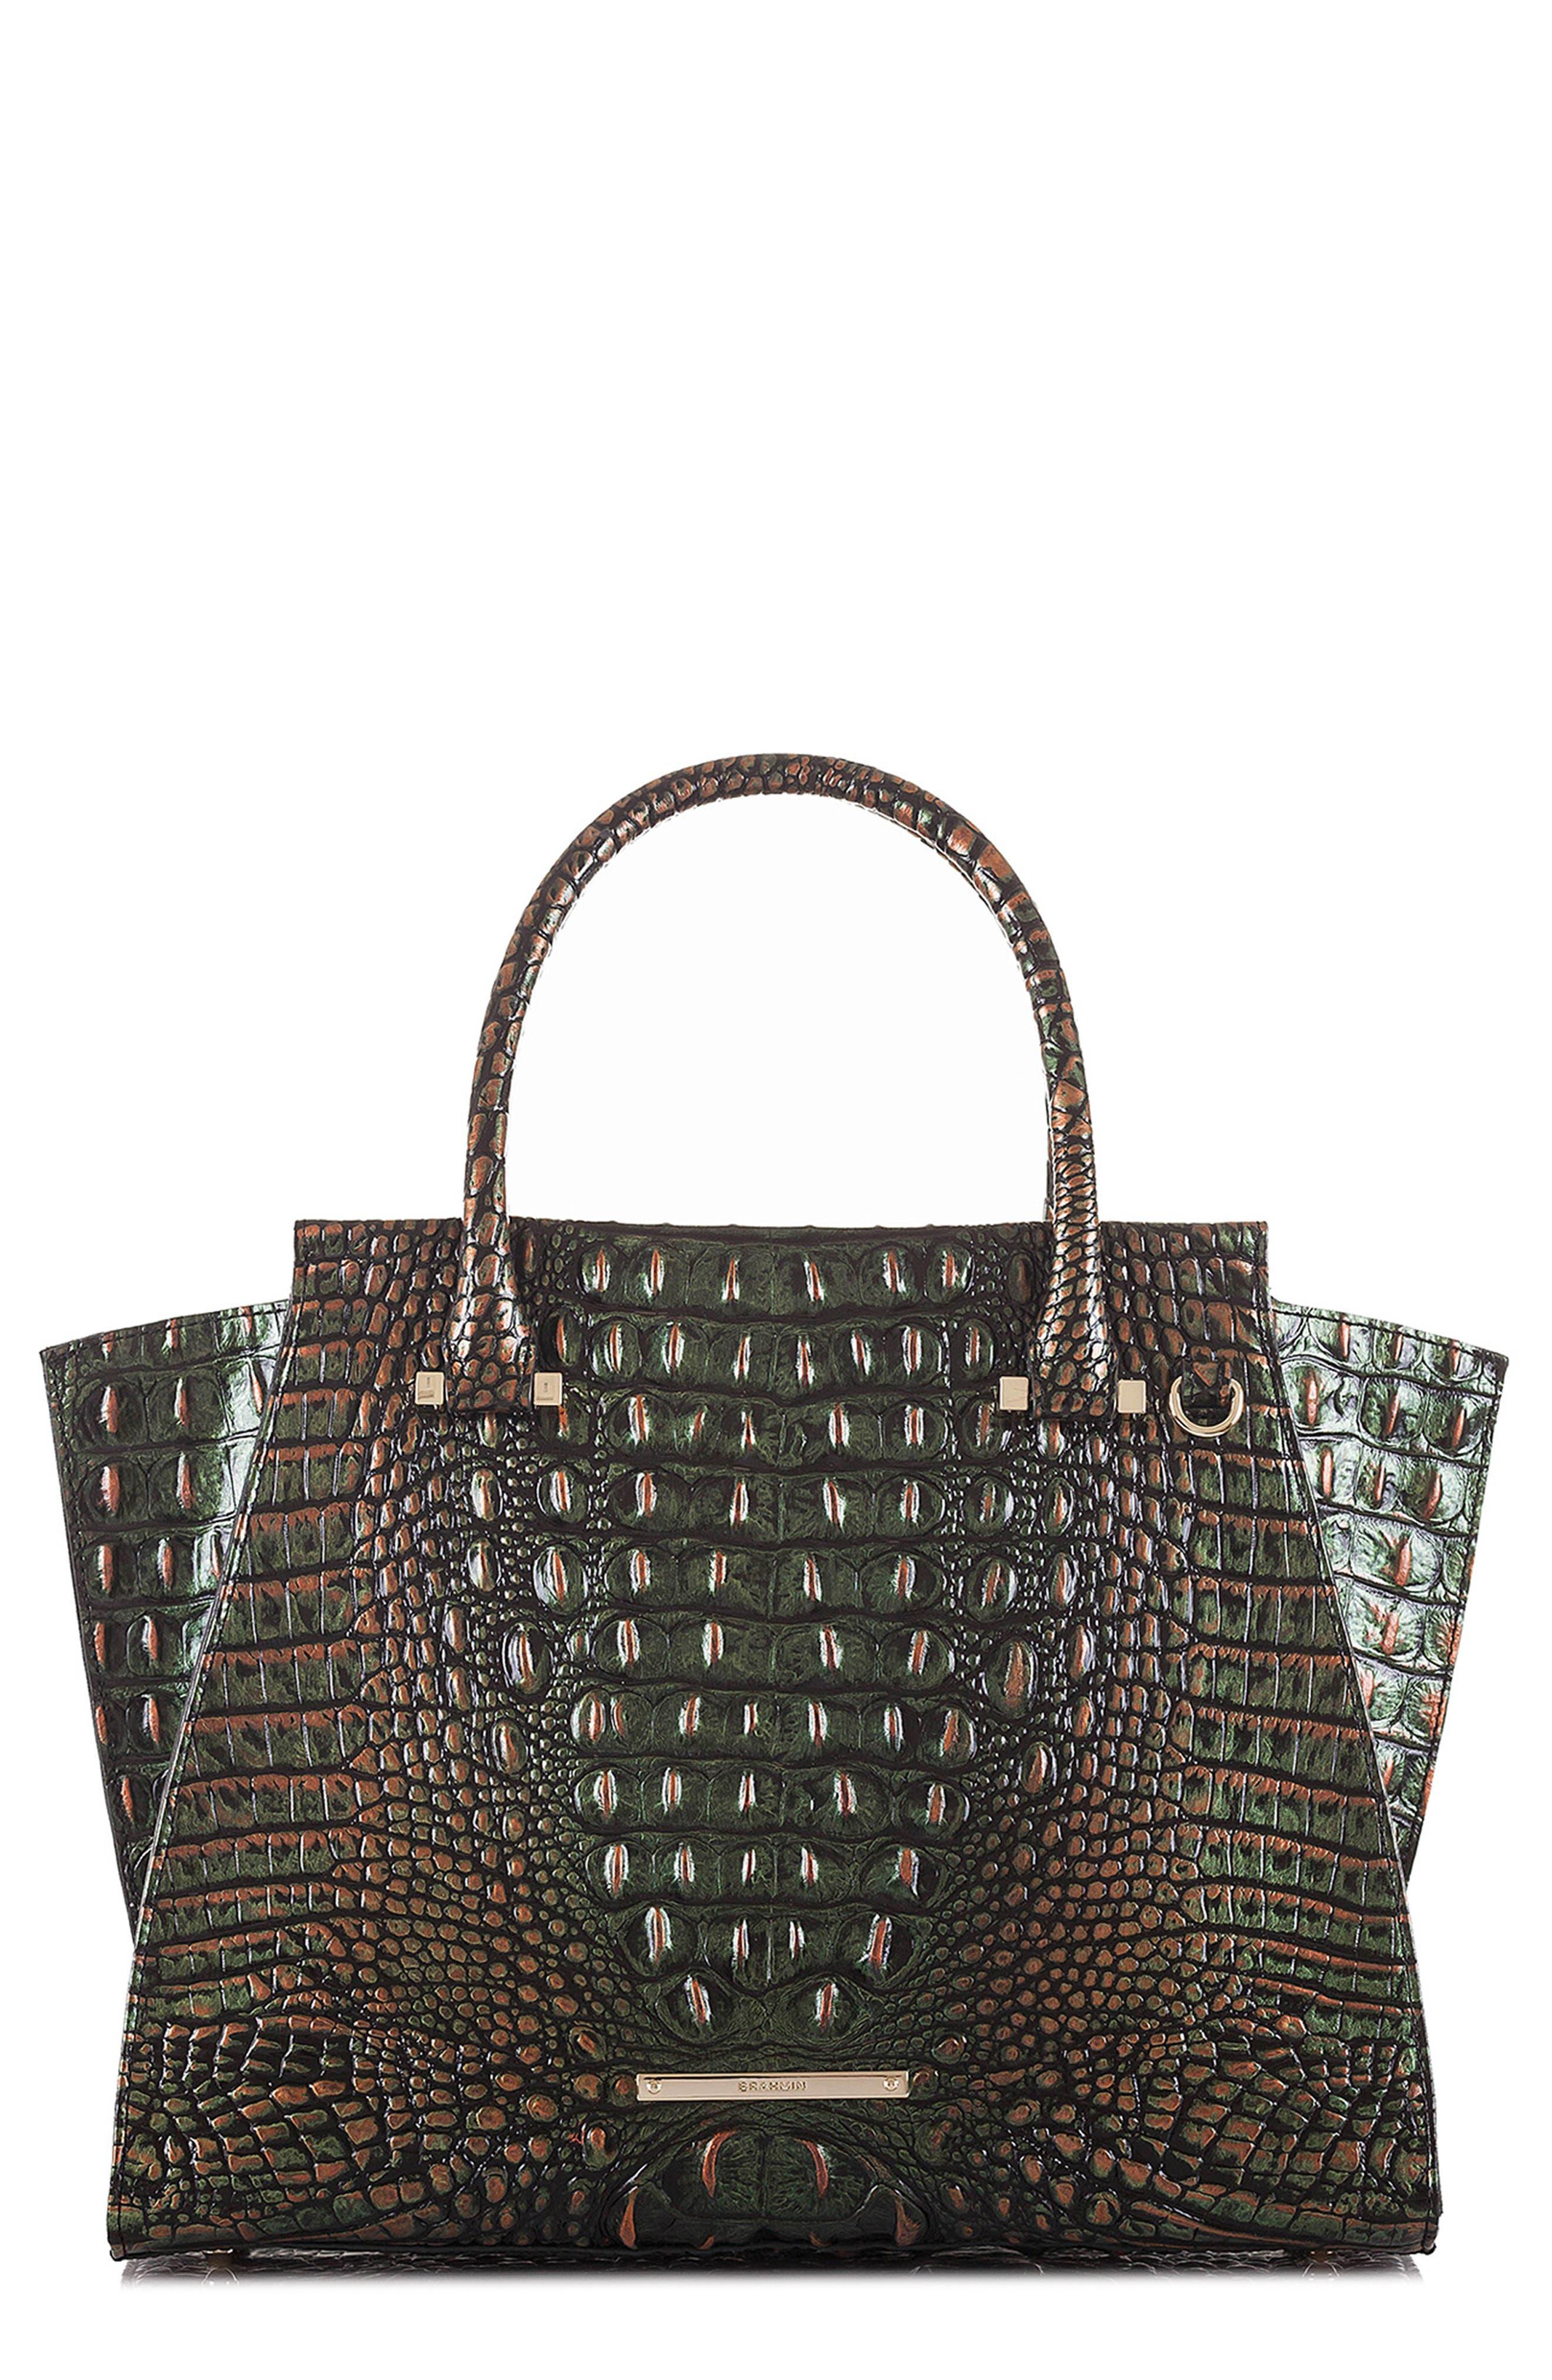 'Priscilla' Croc Embossed Leather Satchel,                             Main thumbnail 1, color,                             203